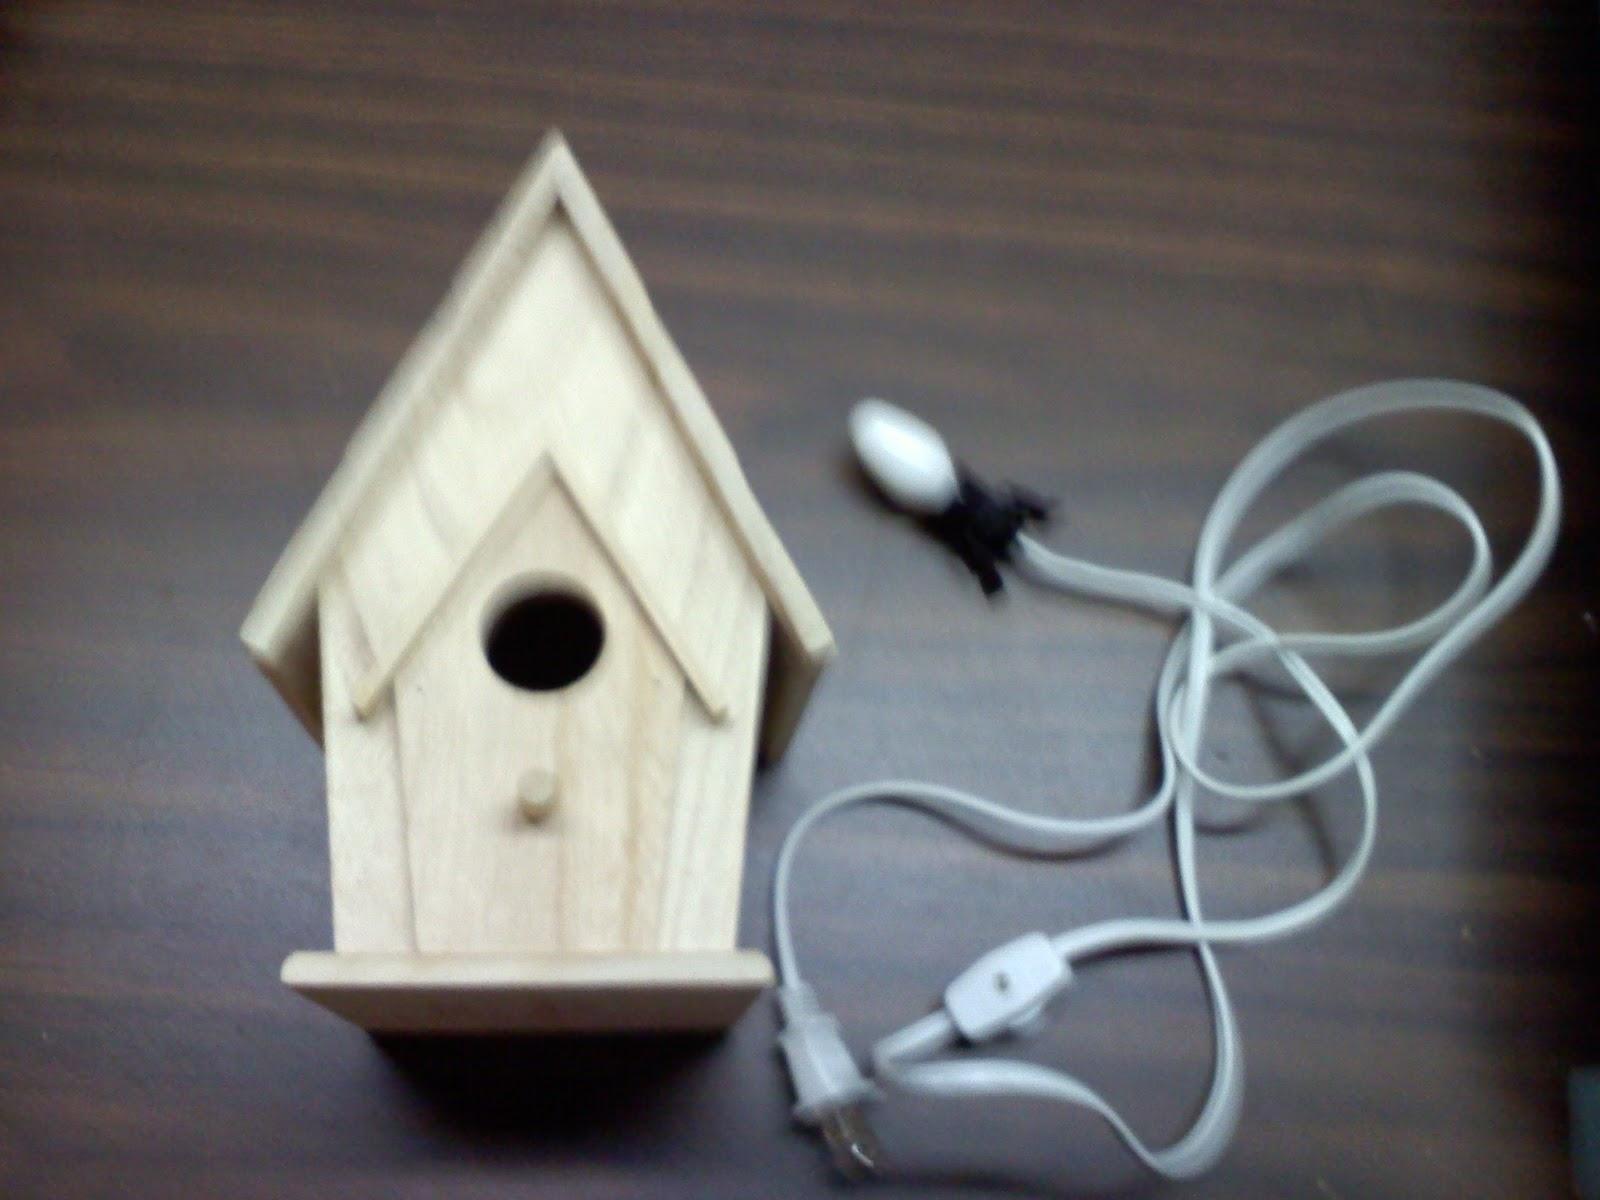 Tiptoethrough diy bird house night light - Birdhouse nightlight ...